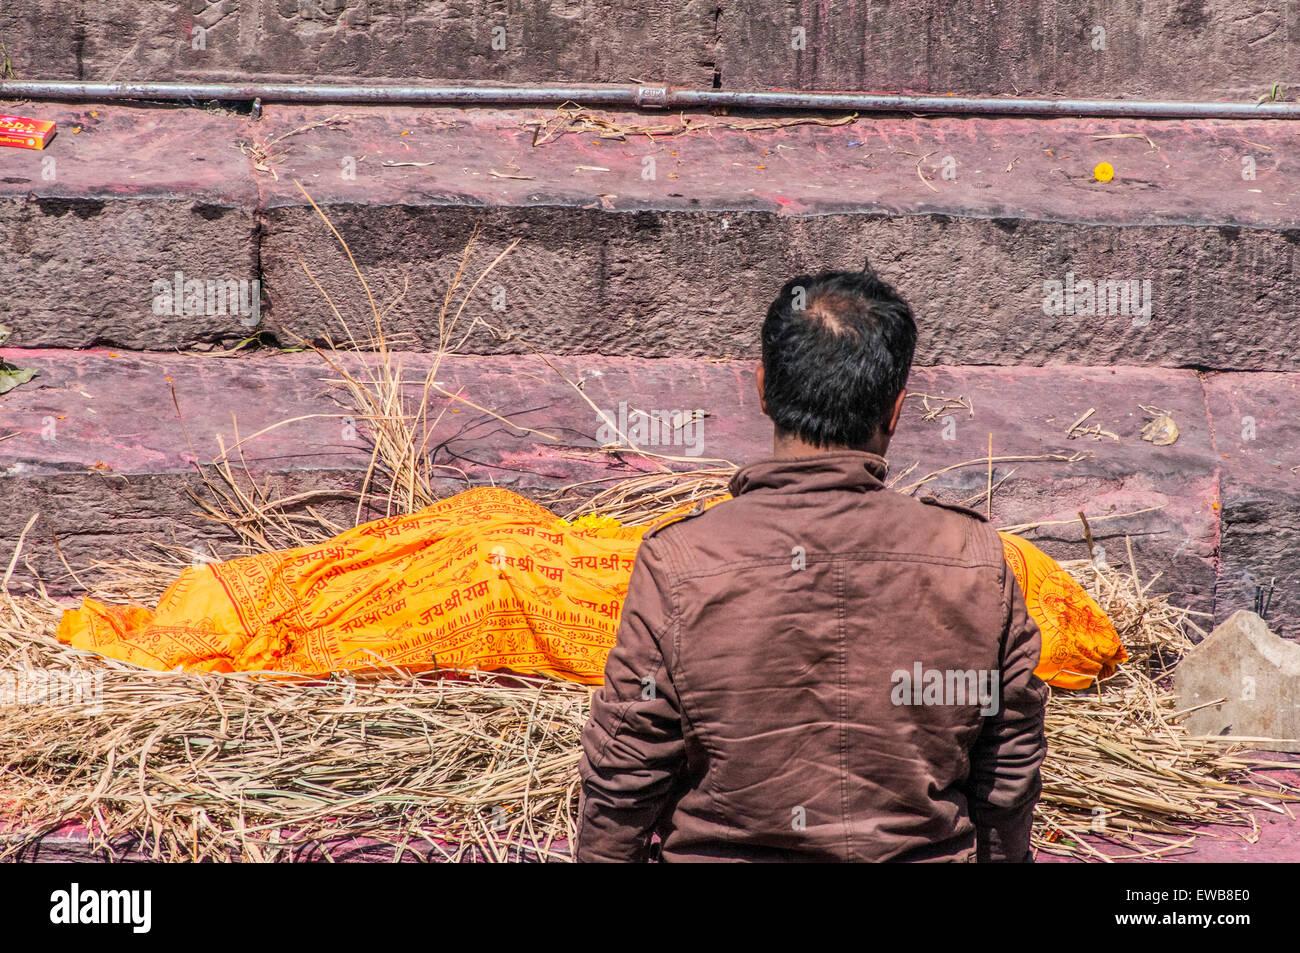 A Hindu funeral at Pashupatinath Temple, a Hindu temple located on the banks of the Bagmati River. Kathmandu, Nepal - Stock Image